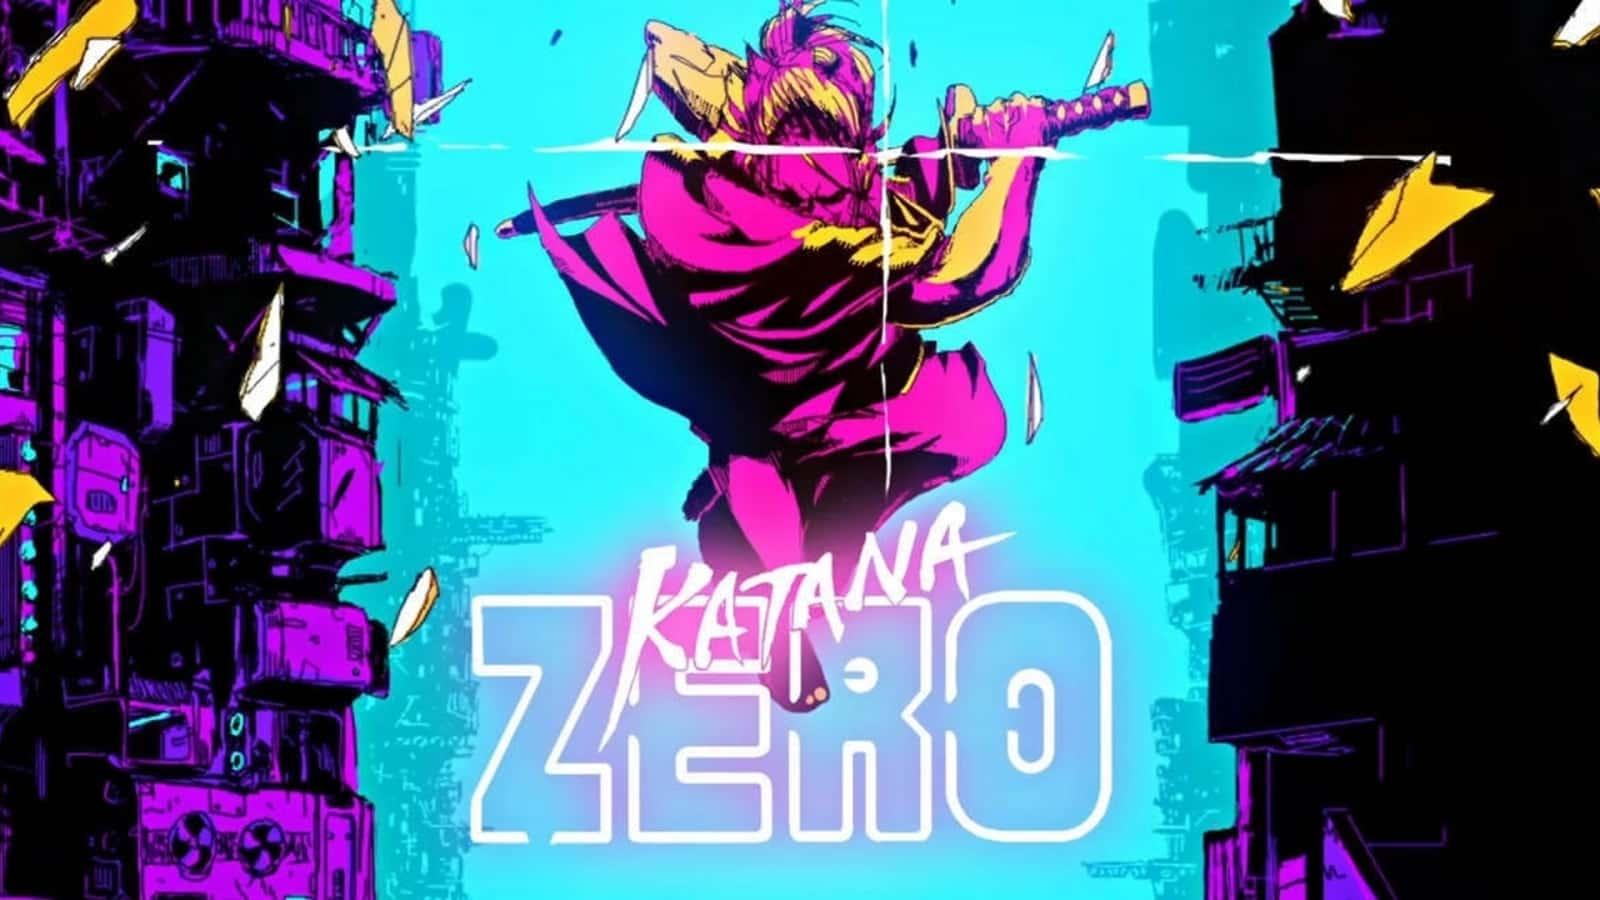 katana zero main screen in pinks and blues